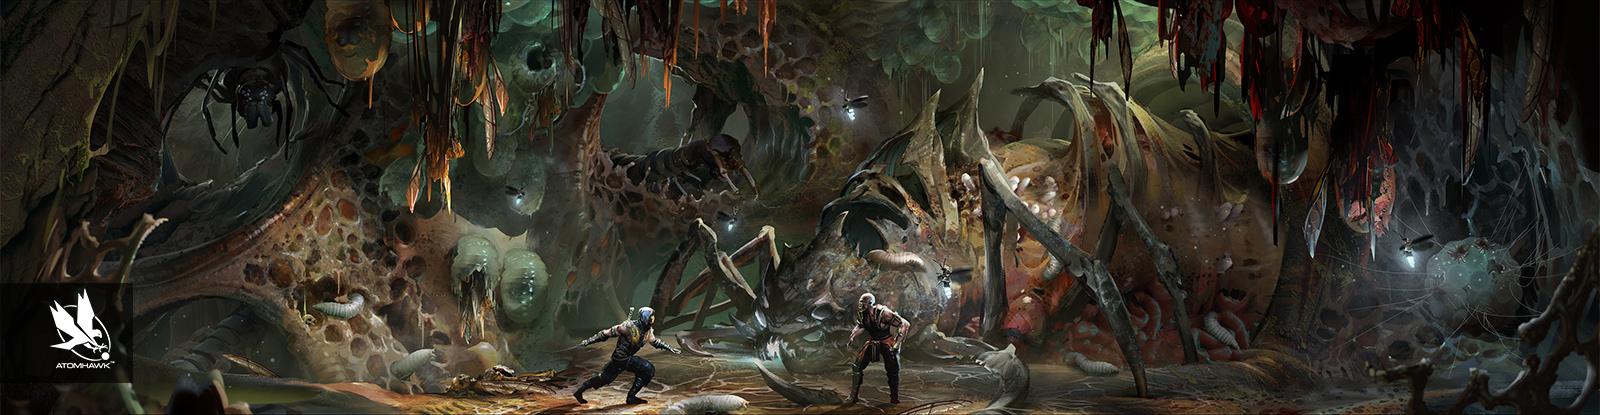 Atomhawk_Warner-Bros-NetherRealm_Mortal-Kombat-11_Concept-Art_Environment-Design_Lost-Hive.jpg